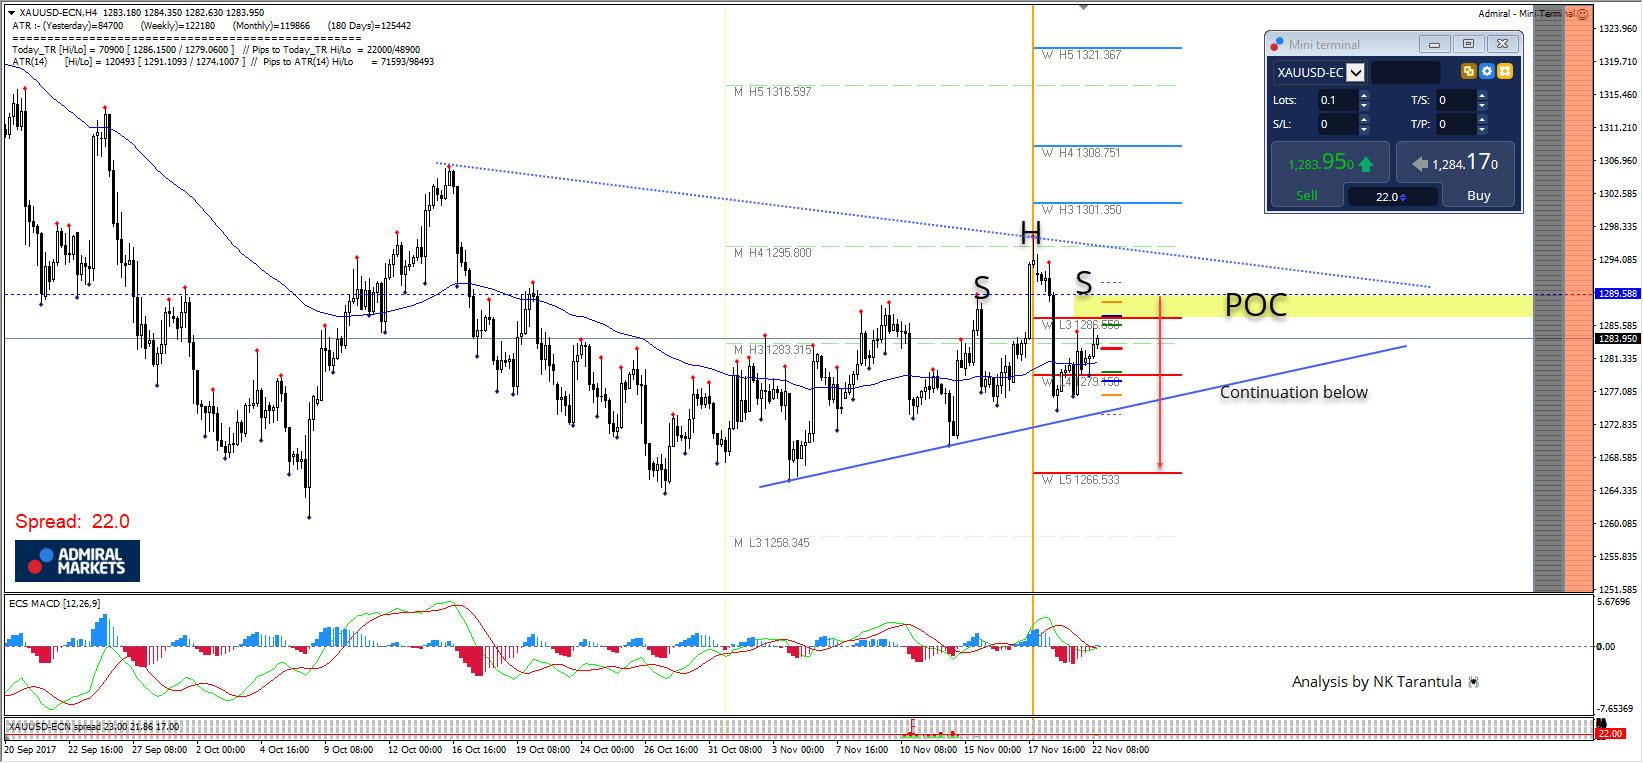 XAU/USD Analysis